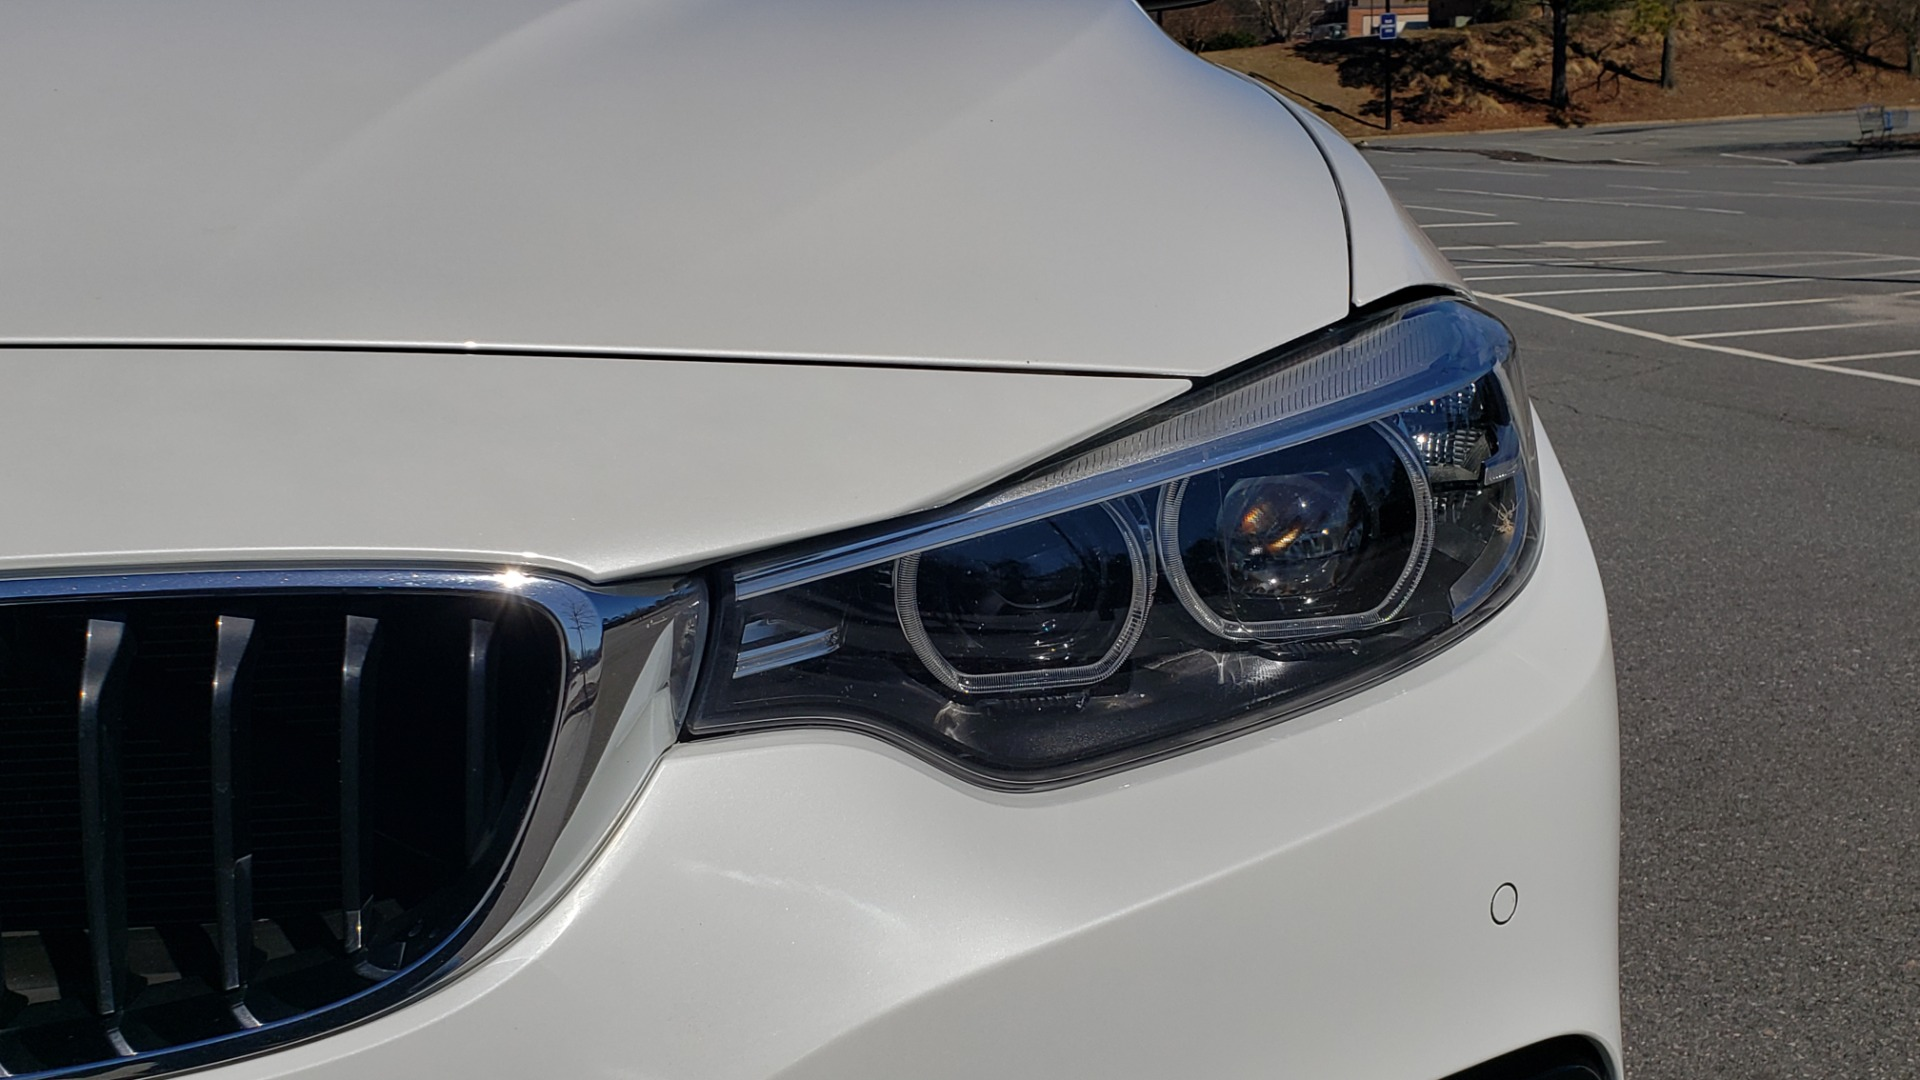 Used 2018 BMW 4 SERIES 430IXDRIVE / PREMIUM / NAV / SUNROOF / ESSENTIALS PKG for sale $28,995 at Formula Imports in Charlotte NC 28227 29